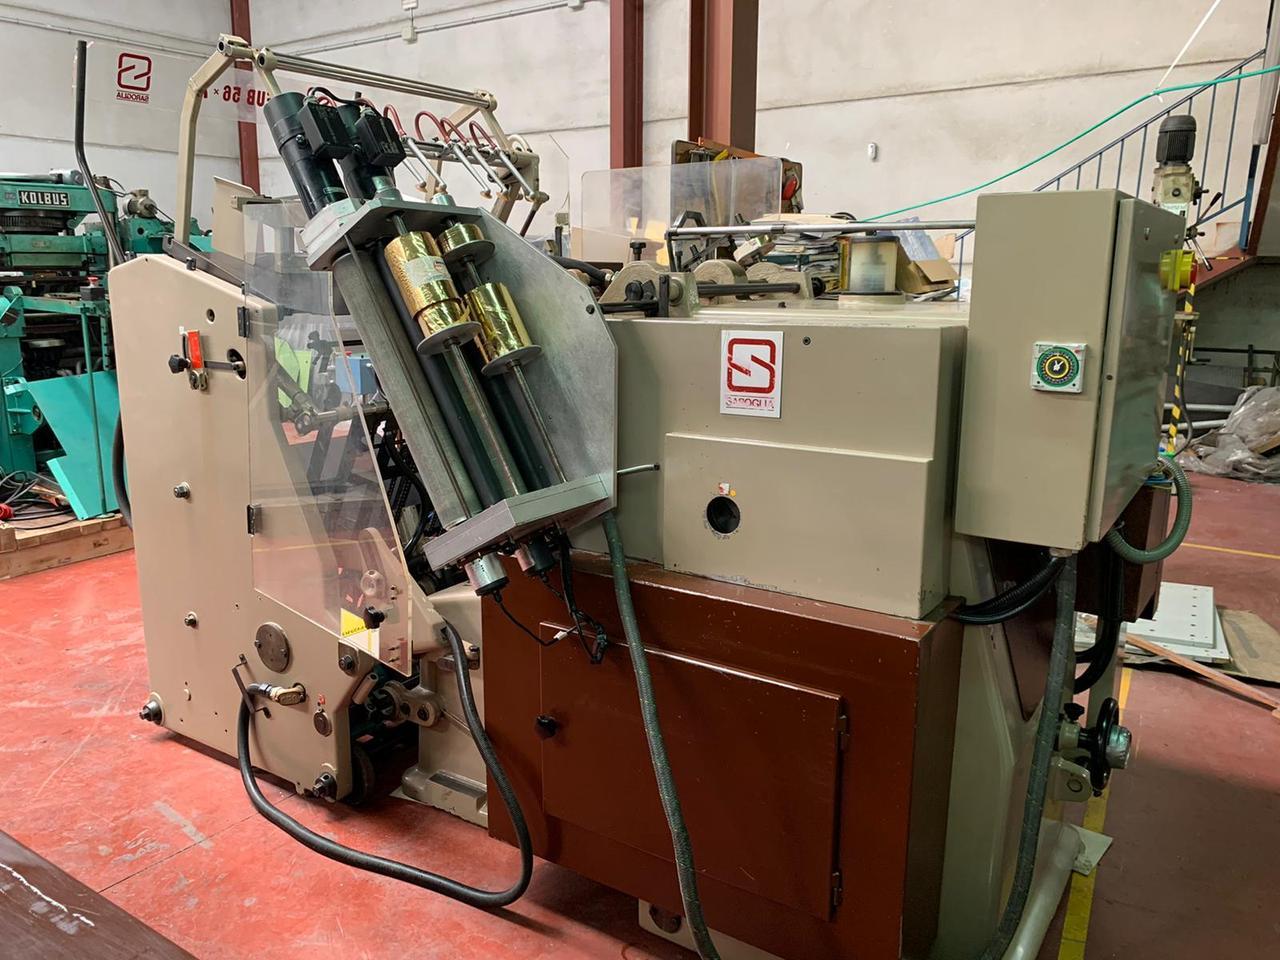 Автоматический пресс высечки и тиснения SAROGLIA FUB 74х56, В2